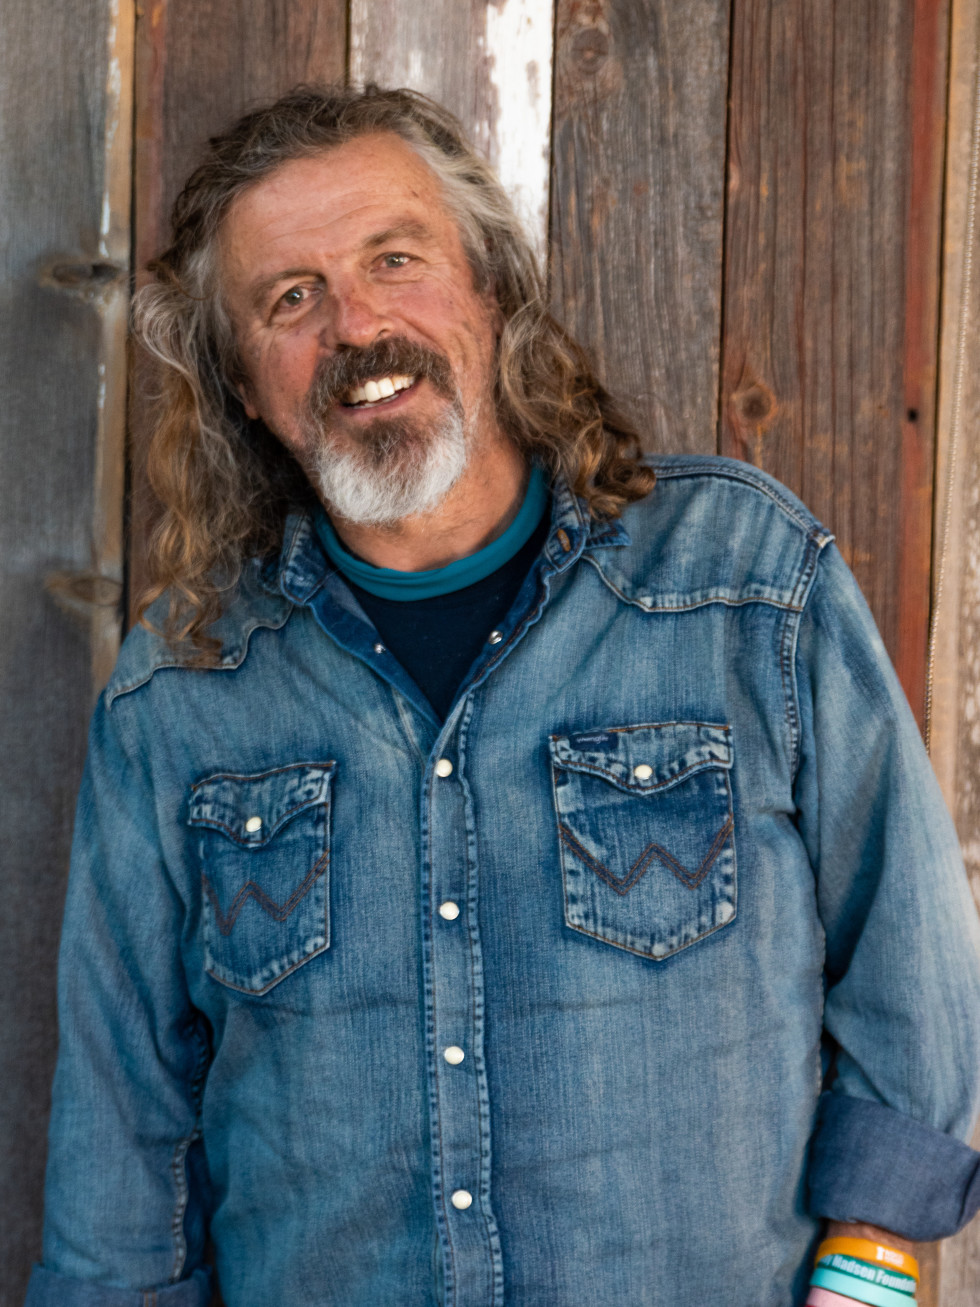 Chef Jack Gilmore